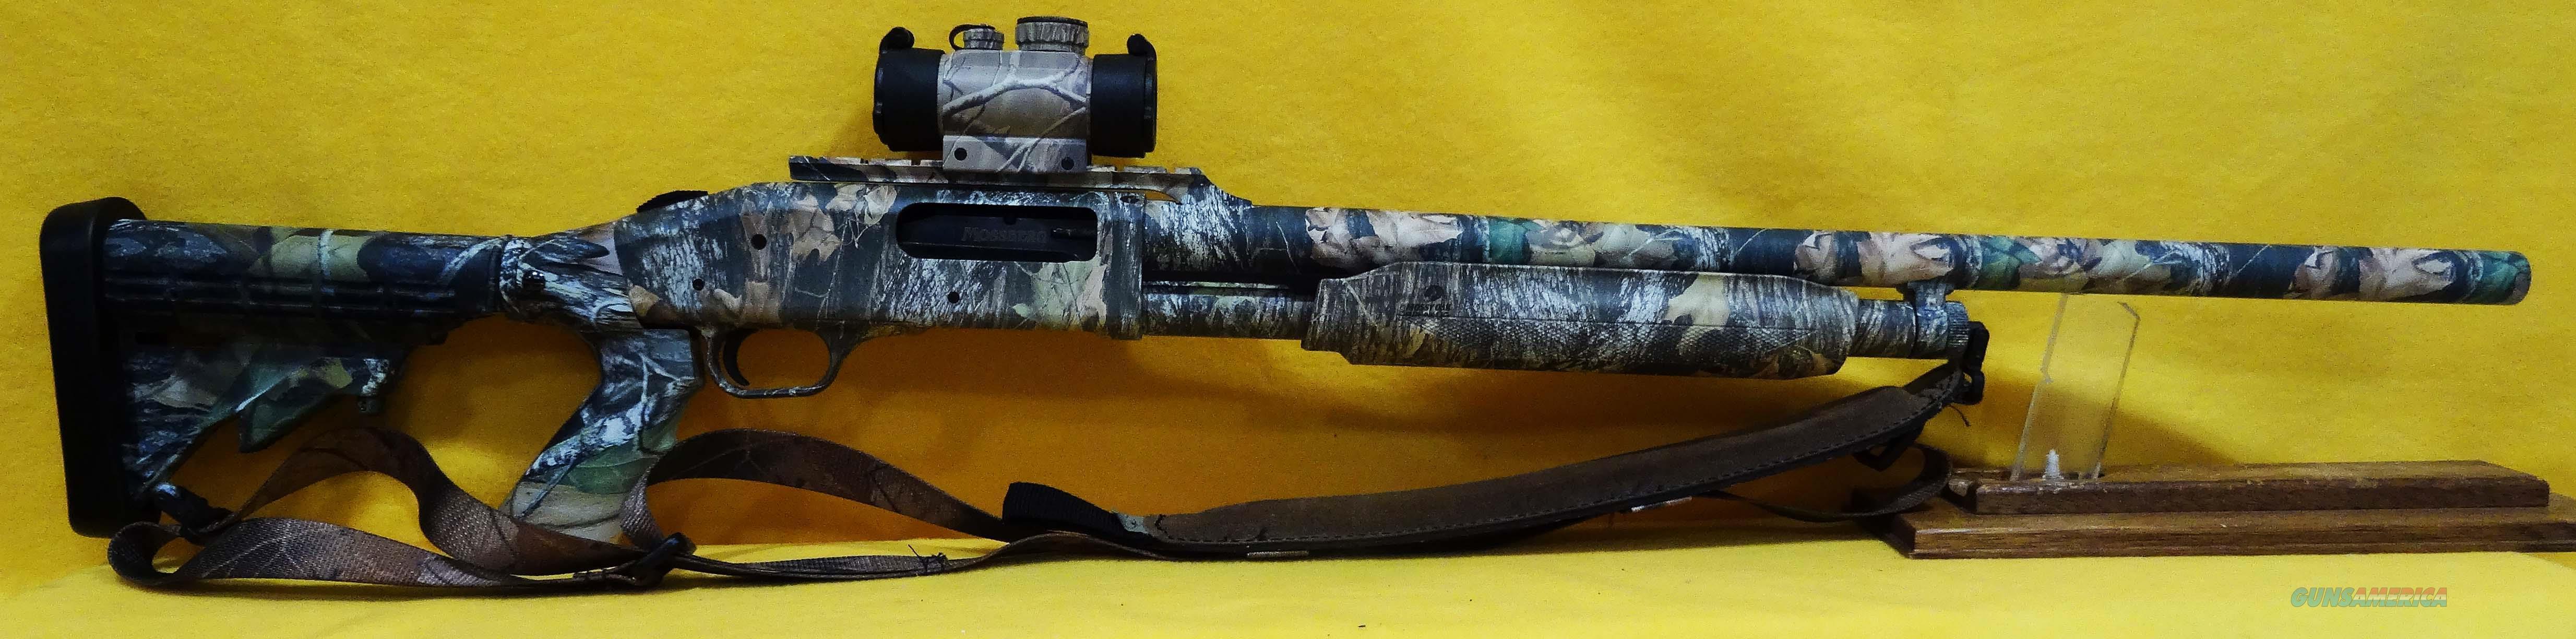 MOSSBERG 535  Guns > Shotguns > Mossberg Shotguns > Pump > Sporting